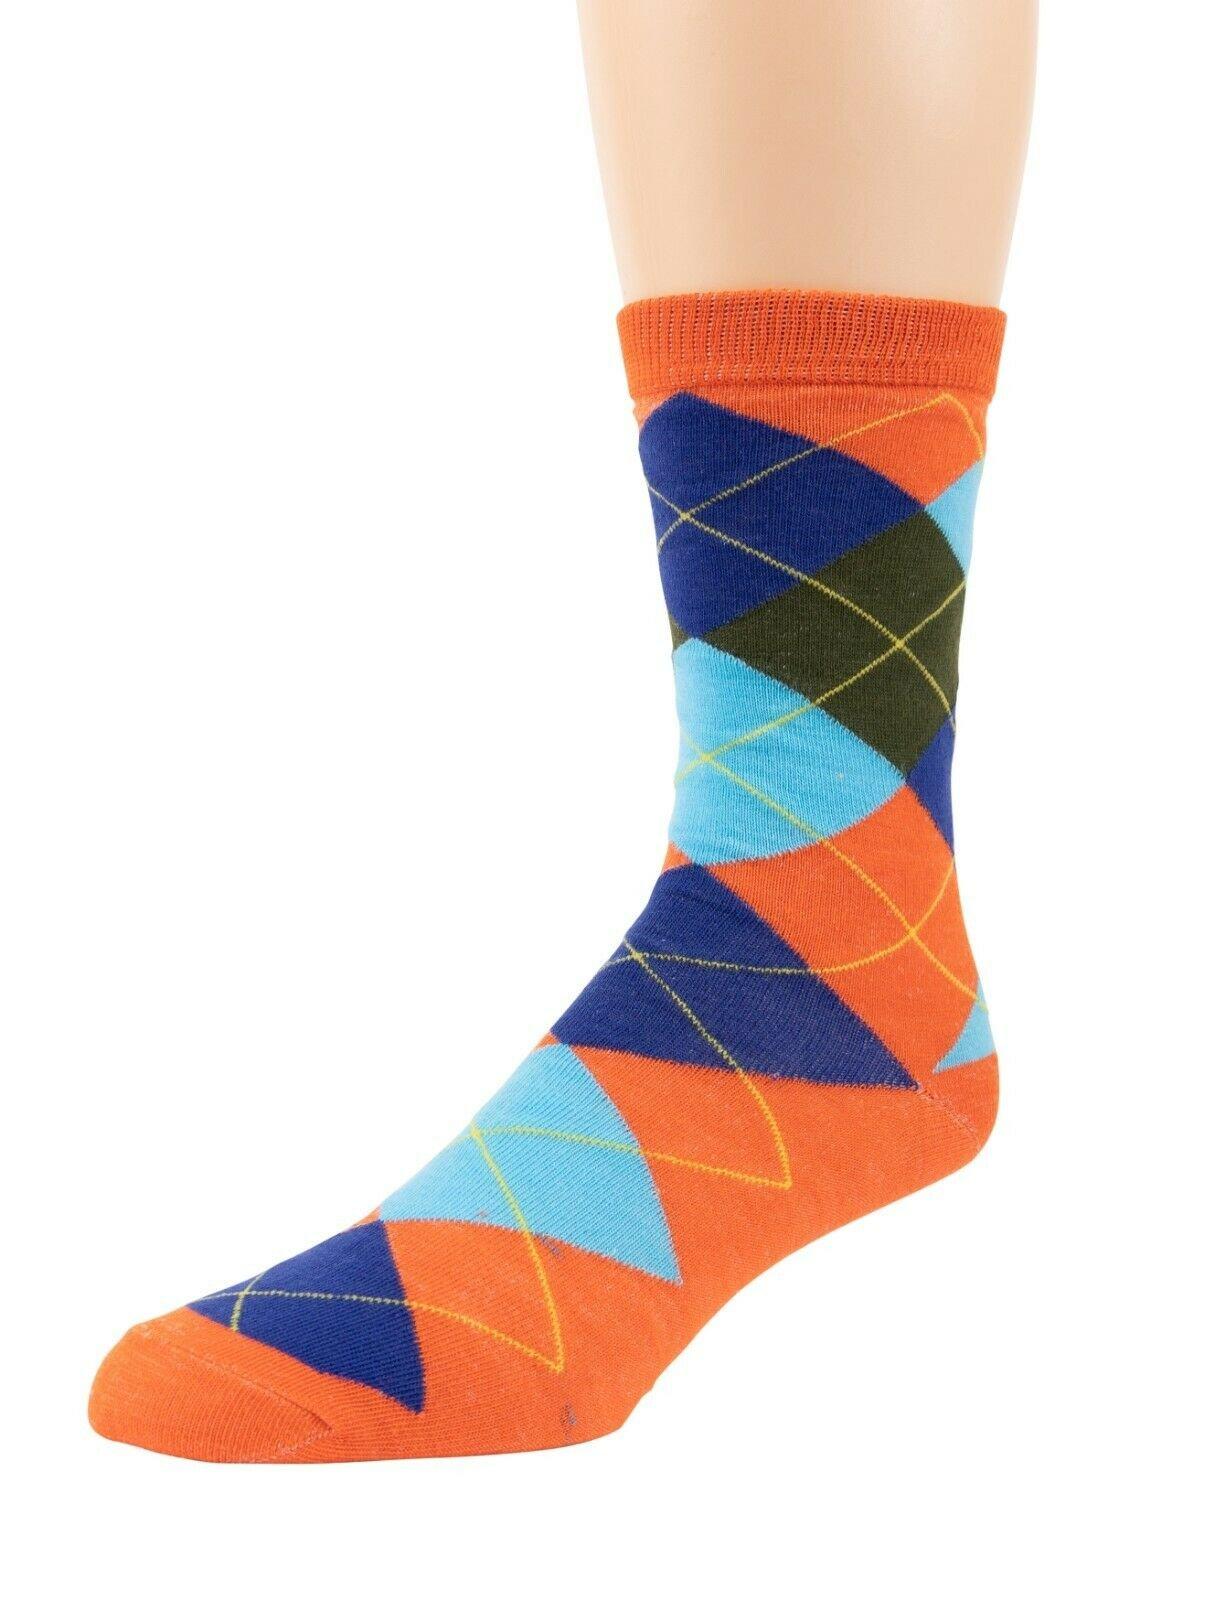 Mitch-Bogen-Mens-Cotton-Dress-Socks-Colorful-Fashion-Crew-Socks-8-Pack-Gift-Box thumbnail 50